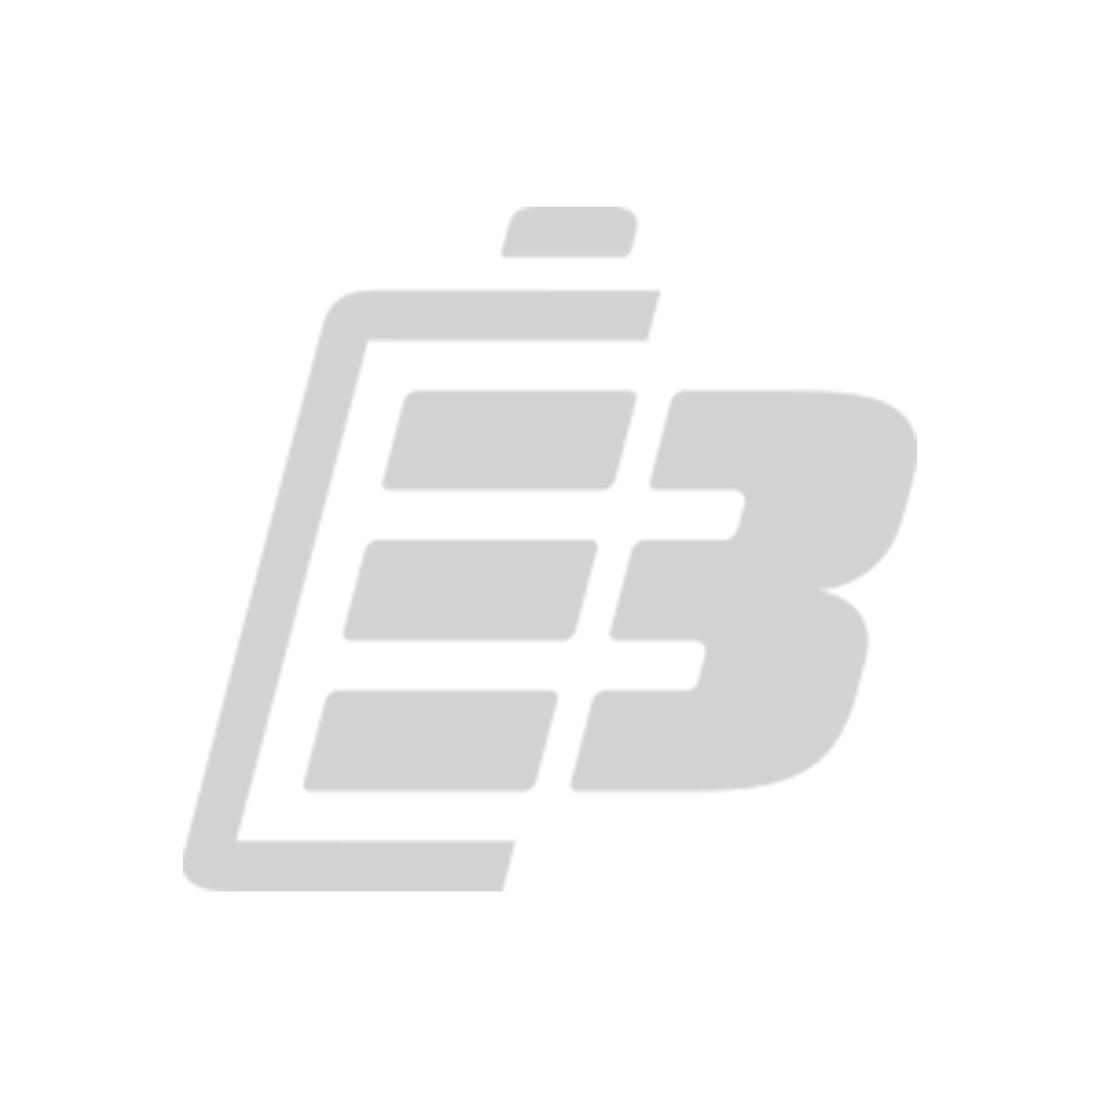 CSB Lead Acid Battery GP12650 1